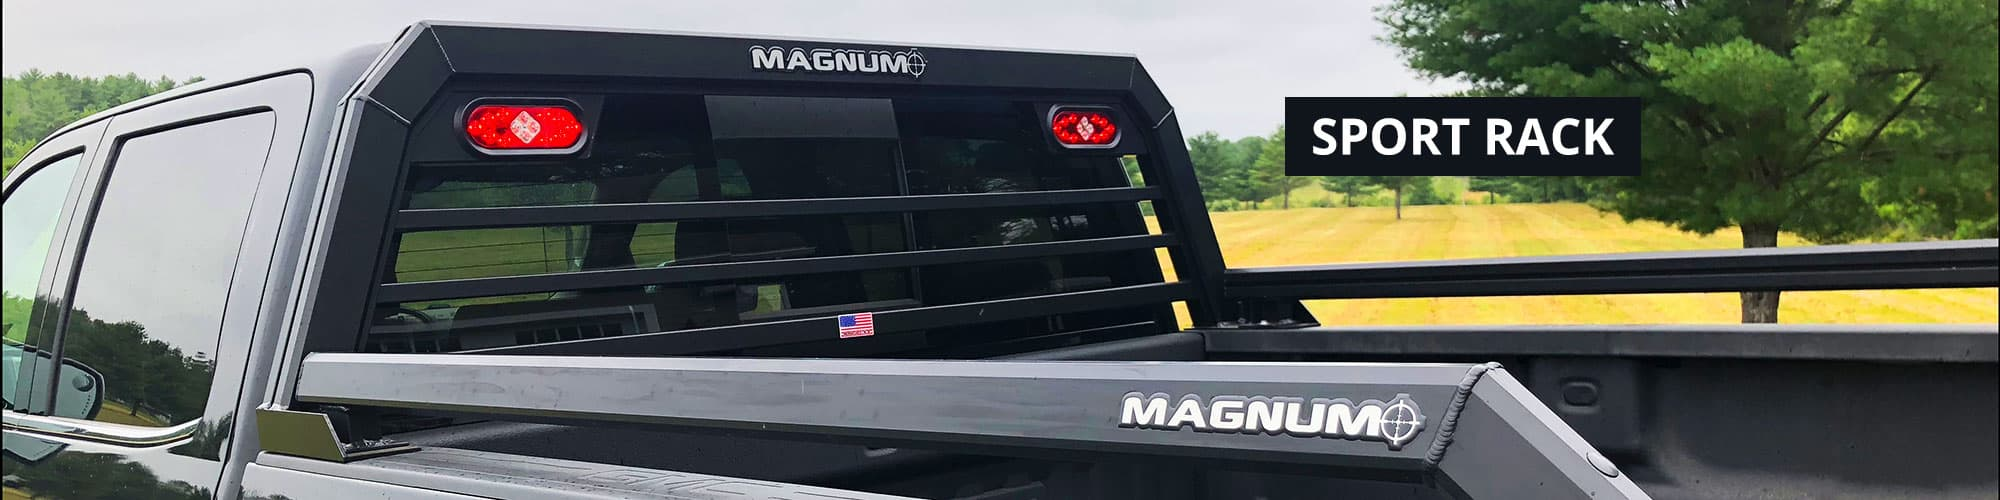 hight resolution of magnum sport rack